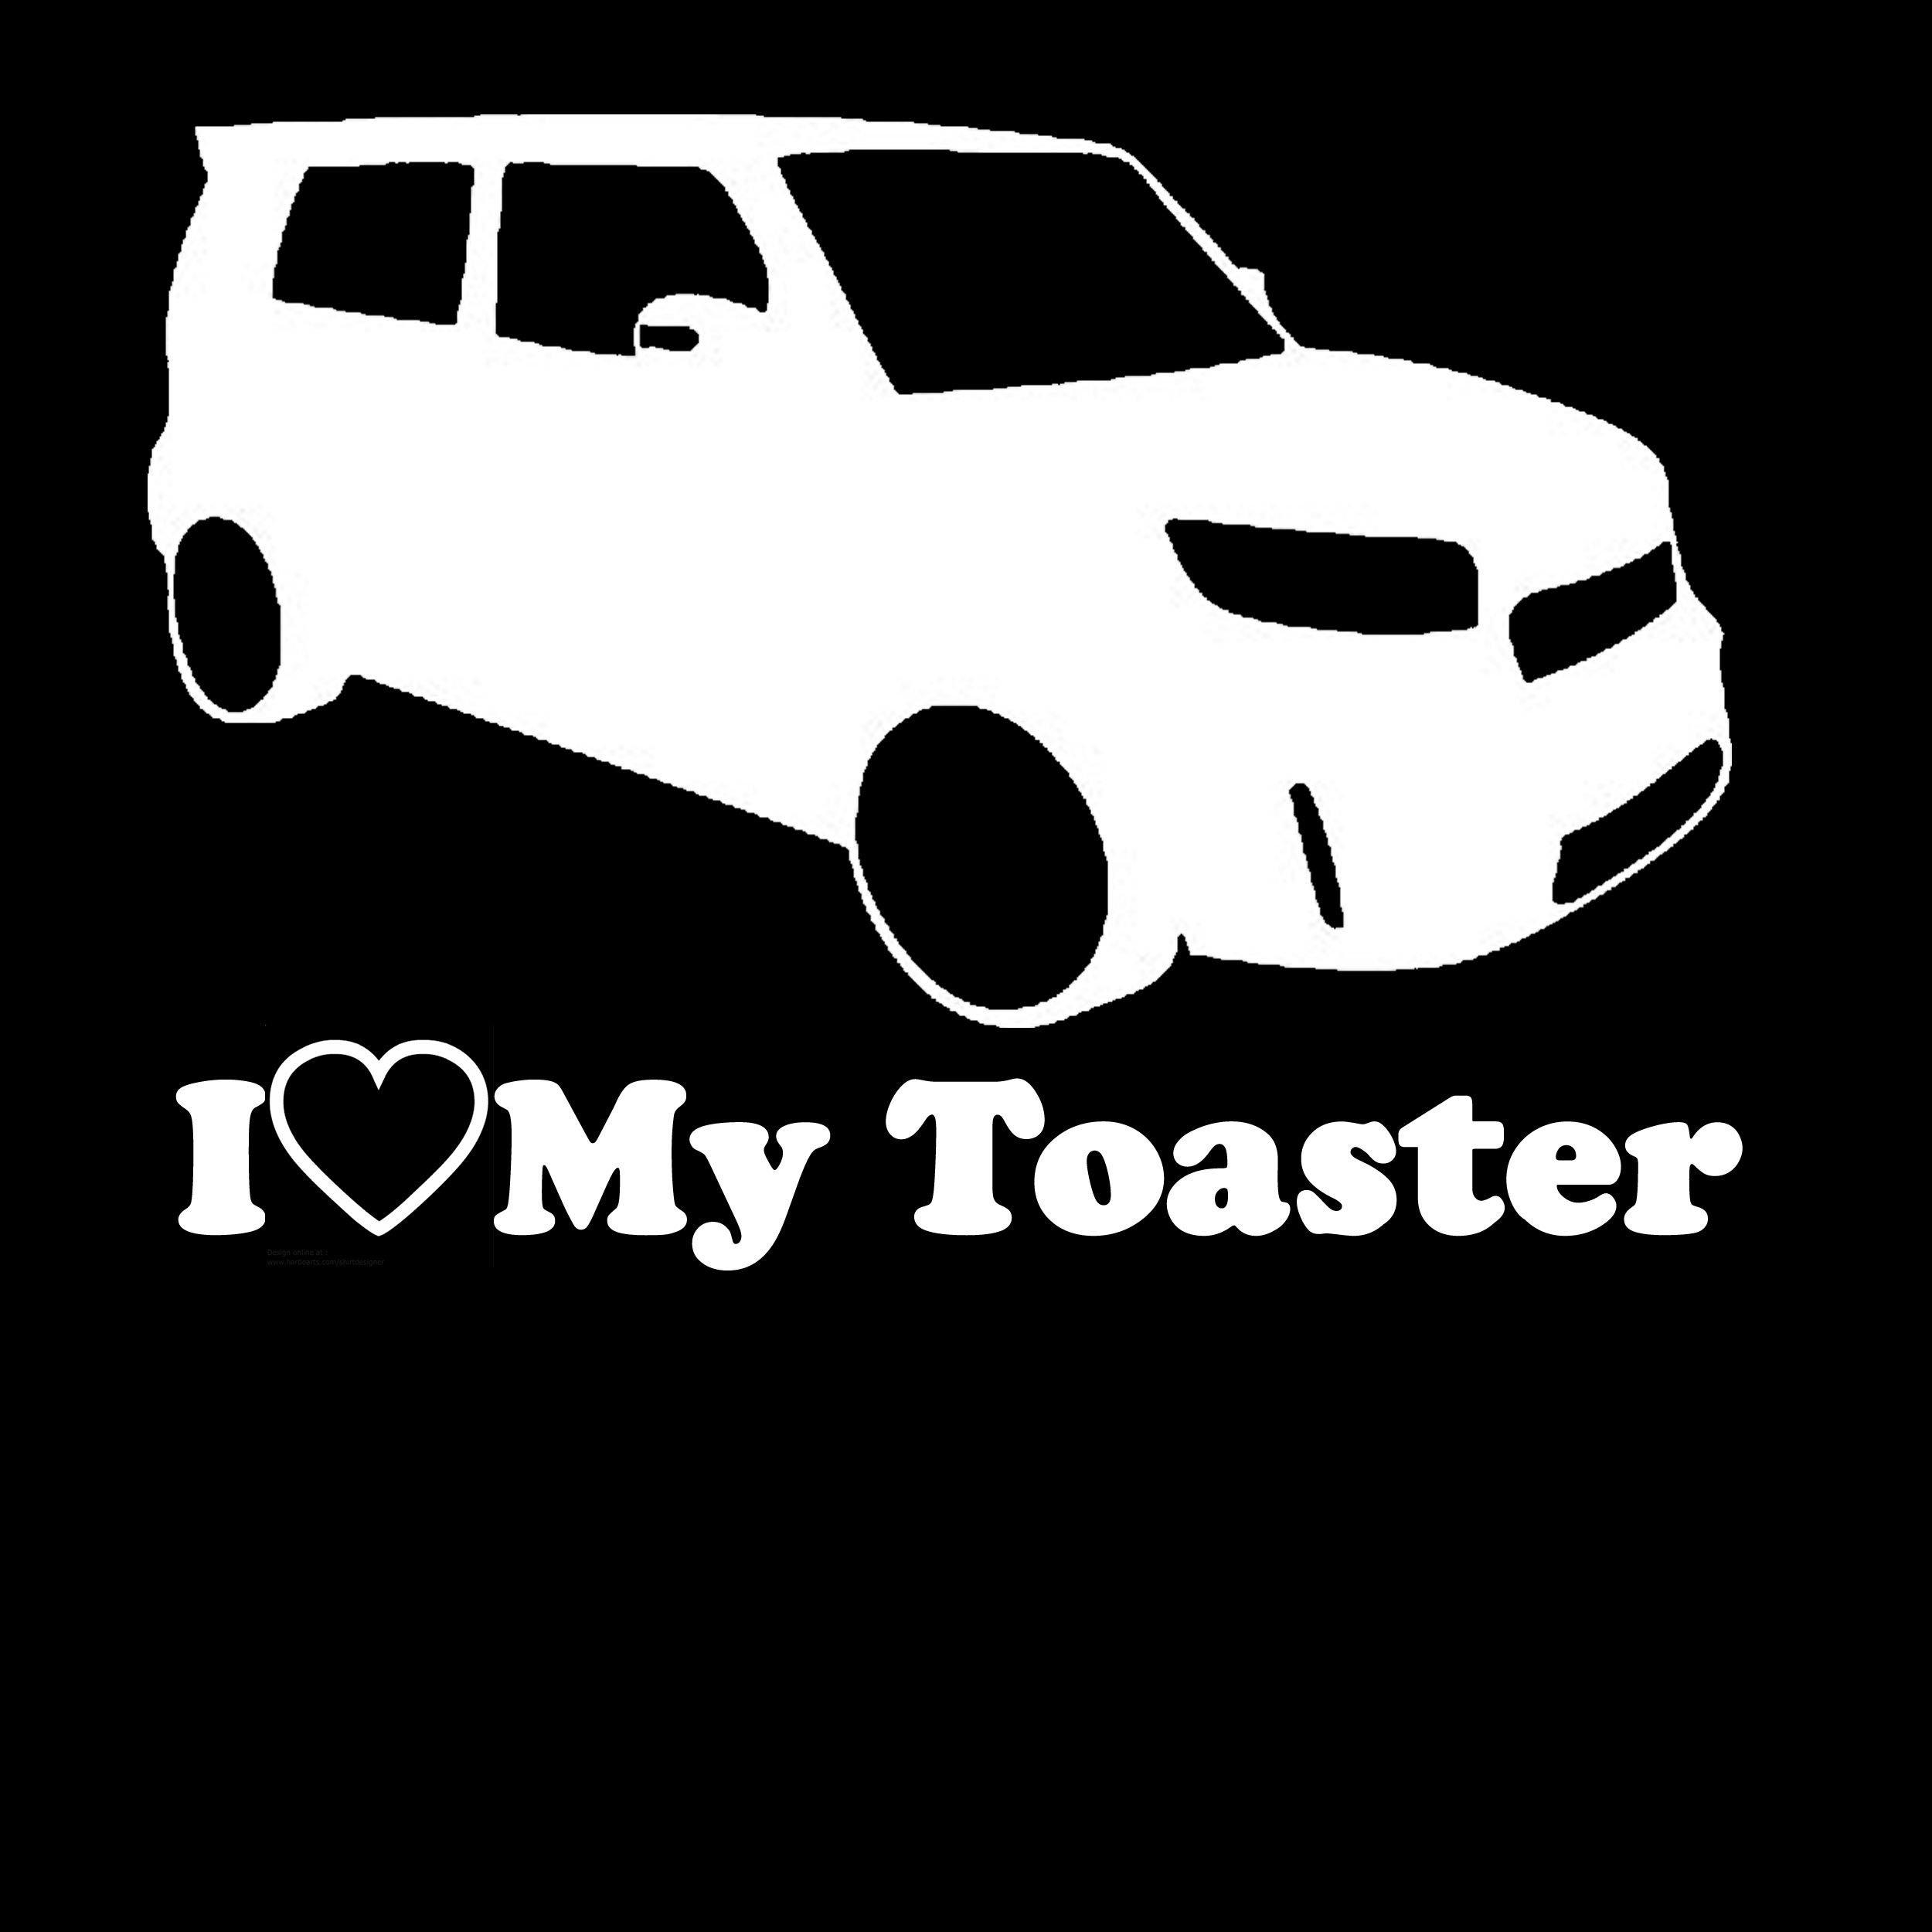 Lifestyle Graphix I Love My Toaster Scion XB Lowered Custom Window Decal